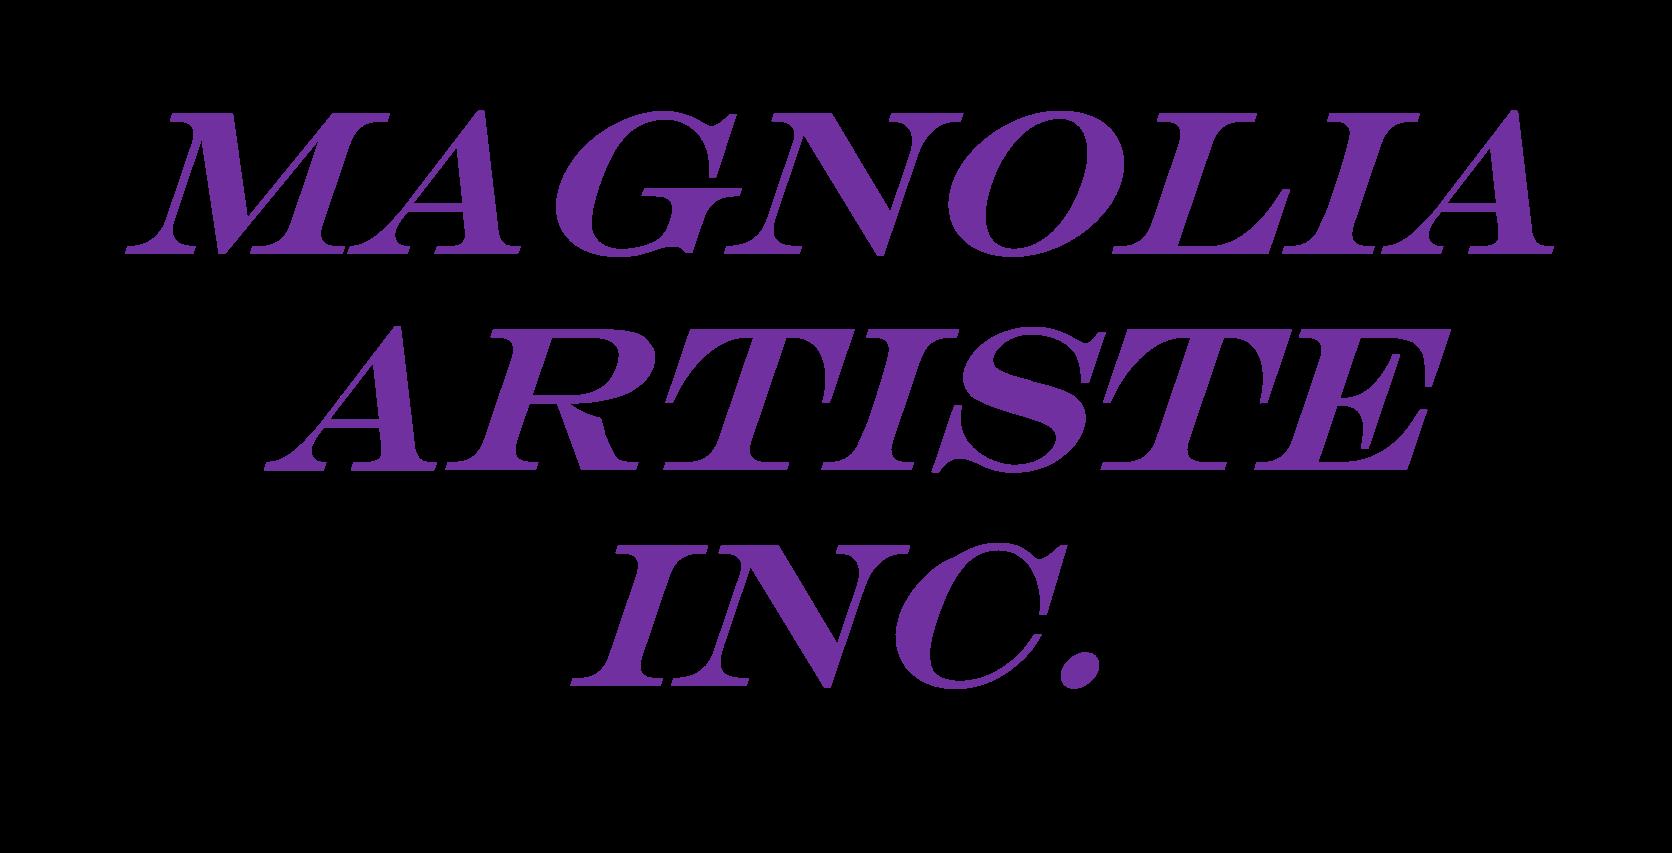 Magnolia Artiste Inc.